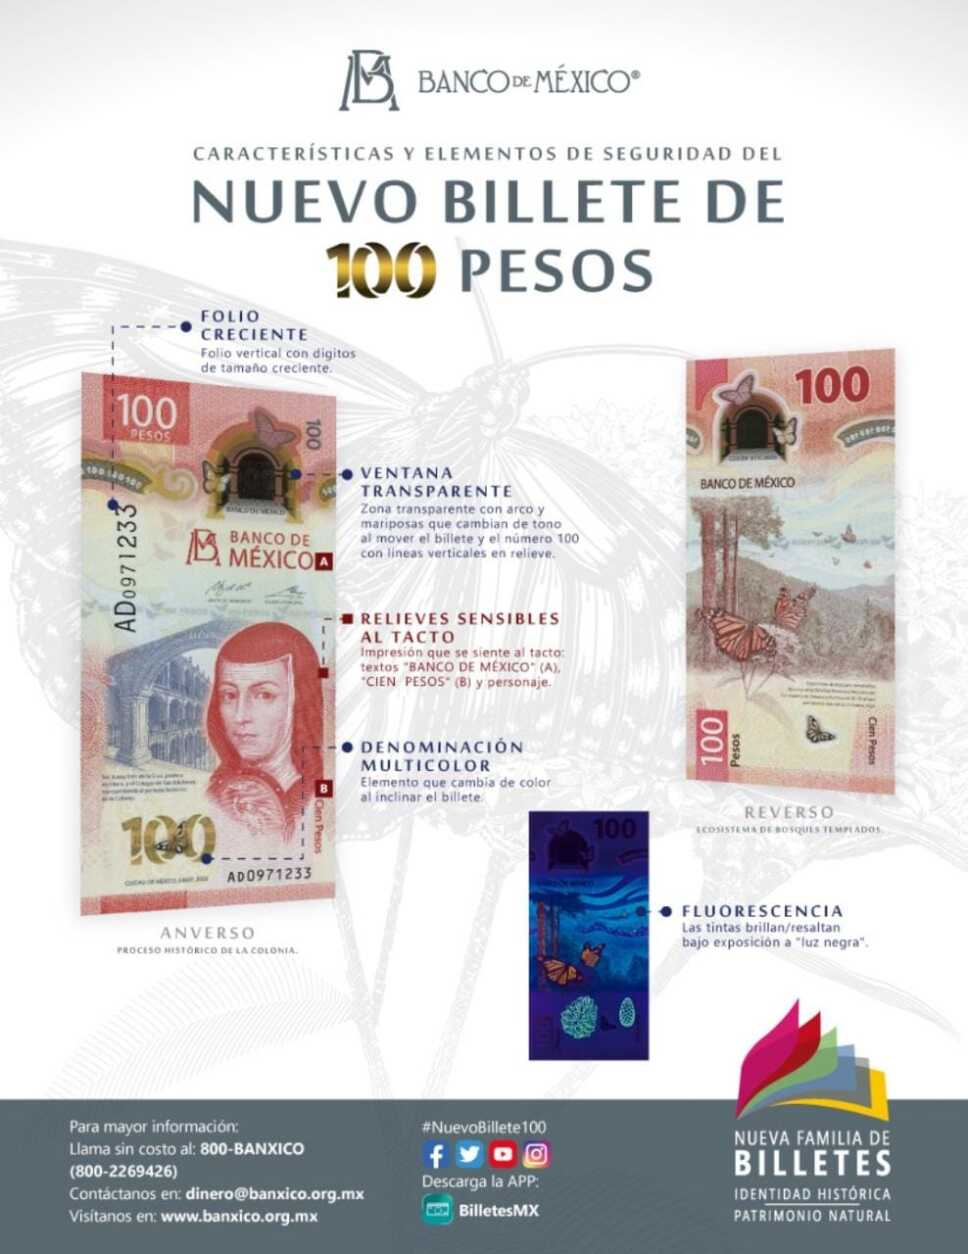 Nuevo billete de 100 pesos con Sor Juana